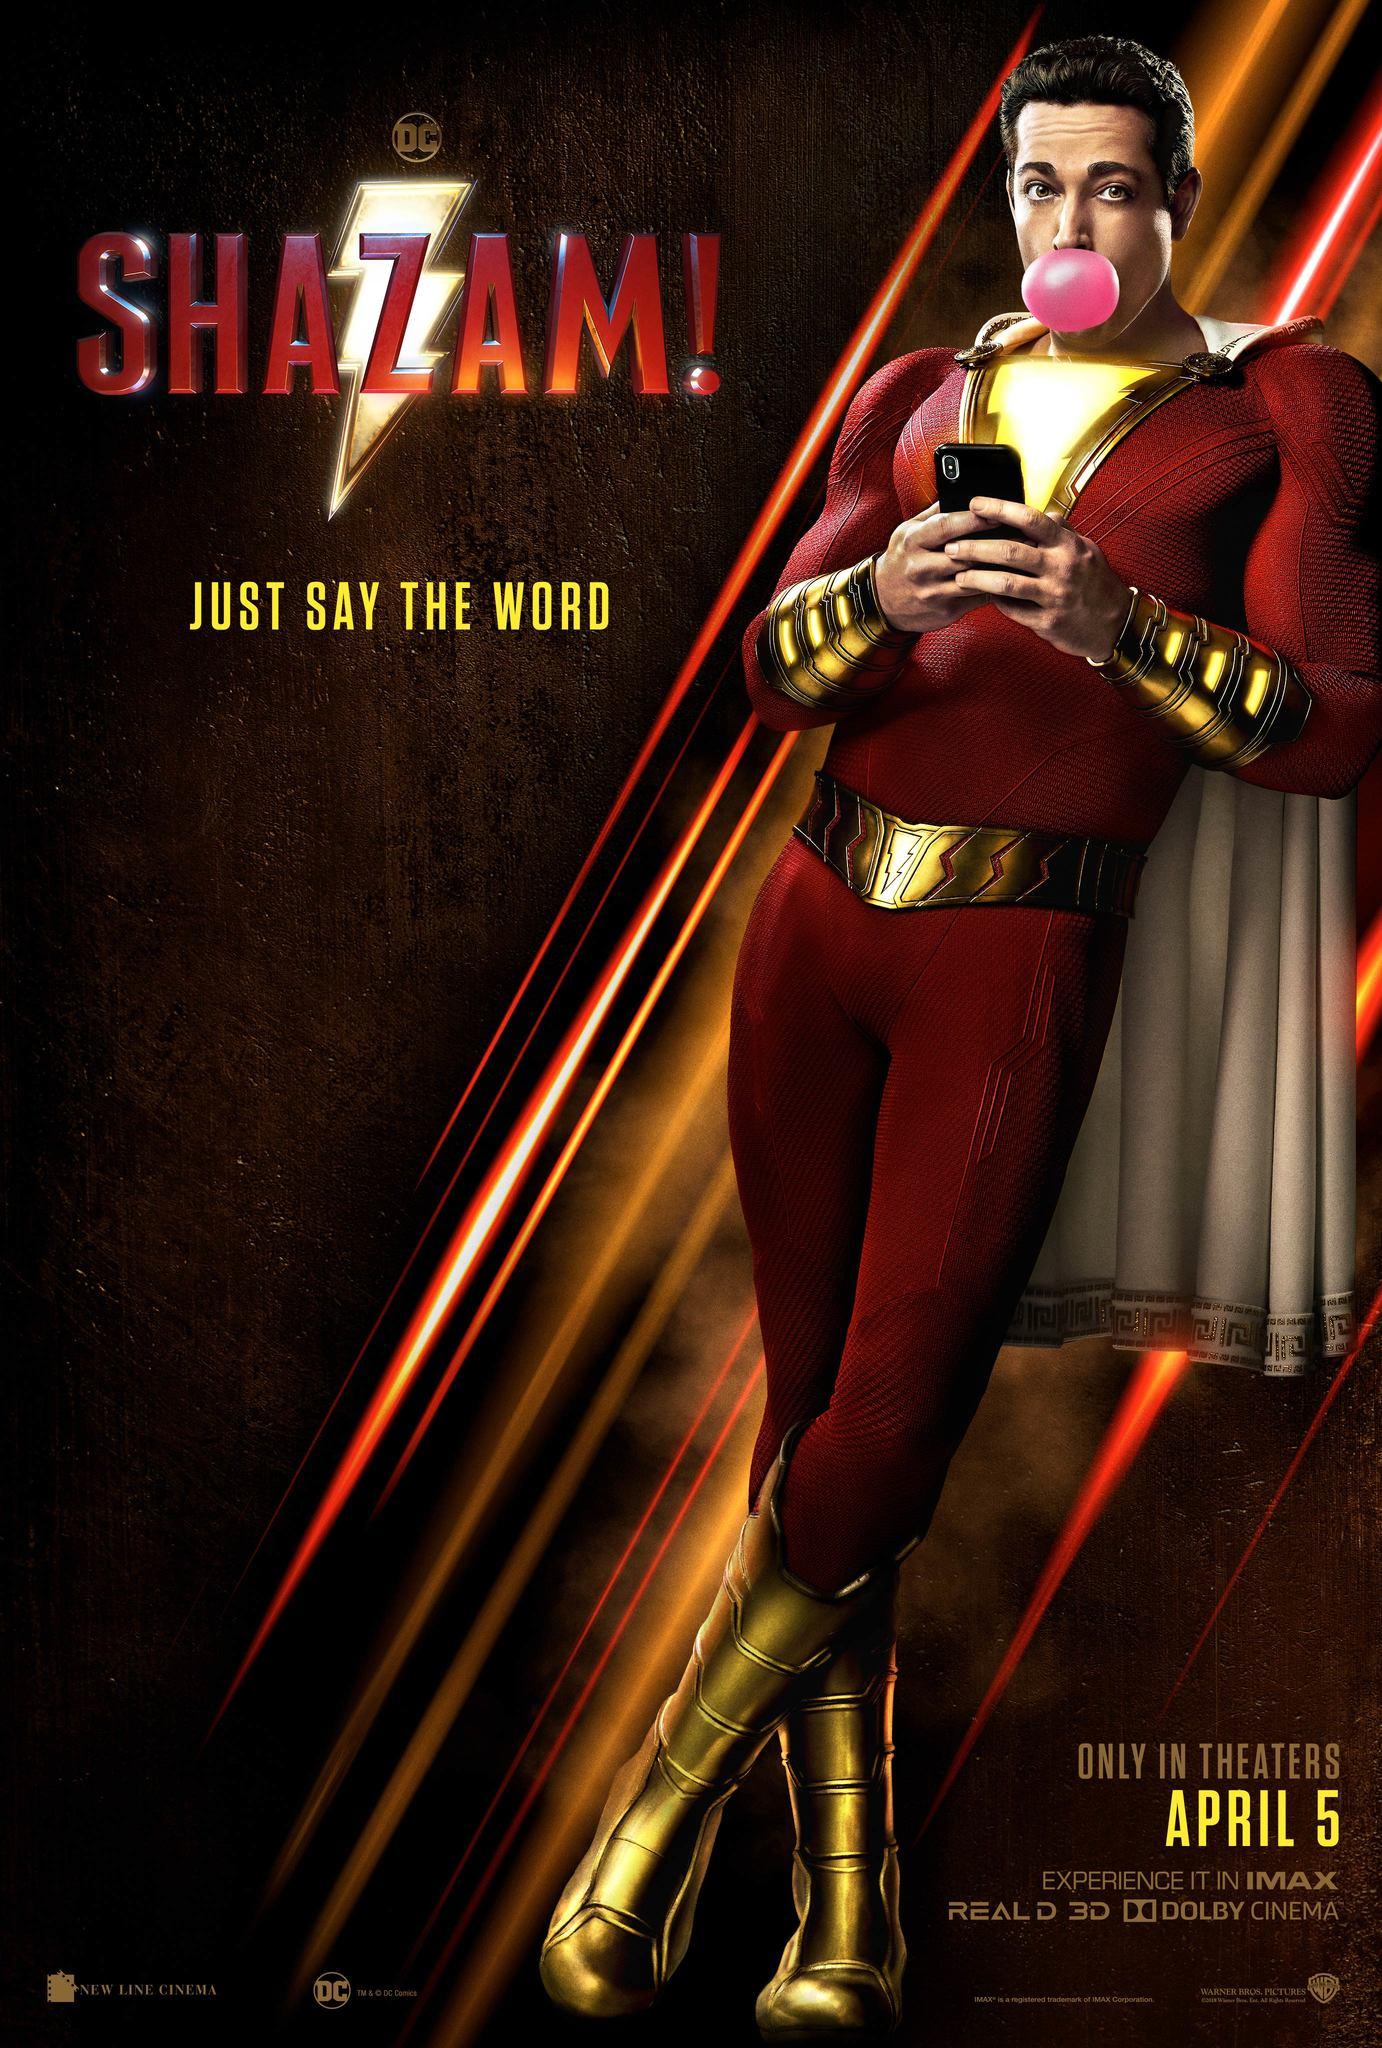 Shazam! – Superpowered Funfair opening